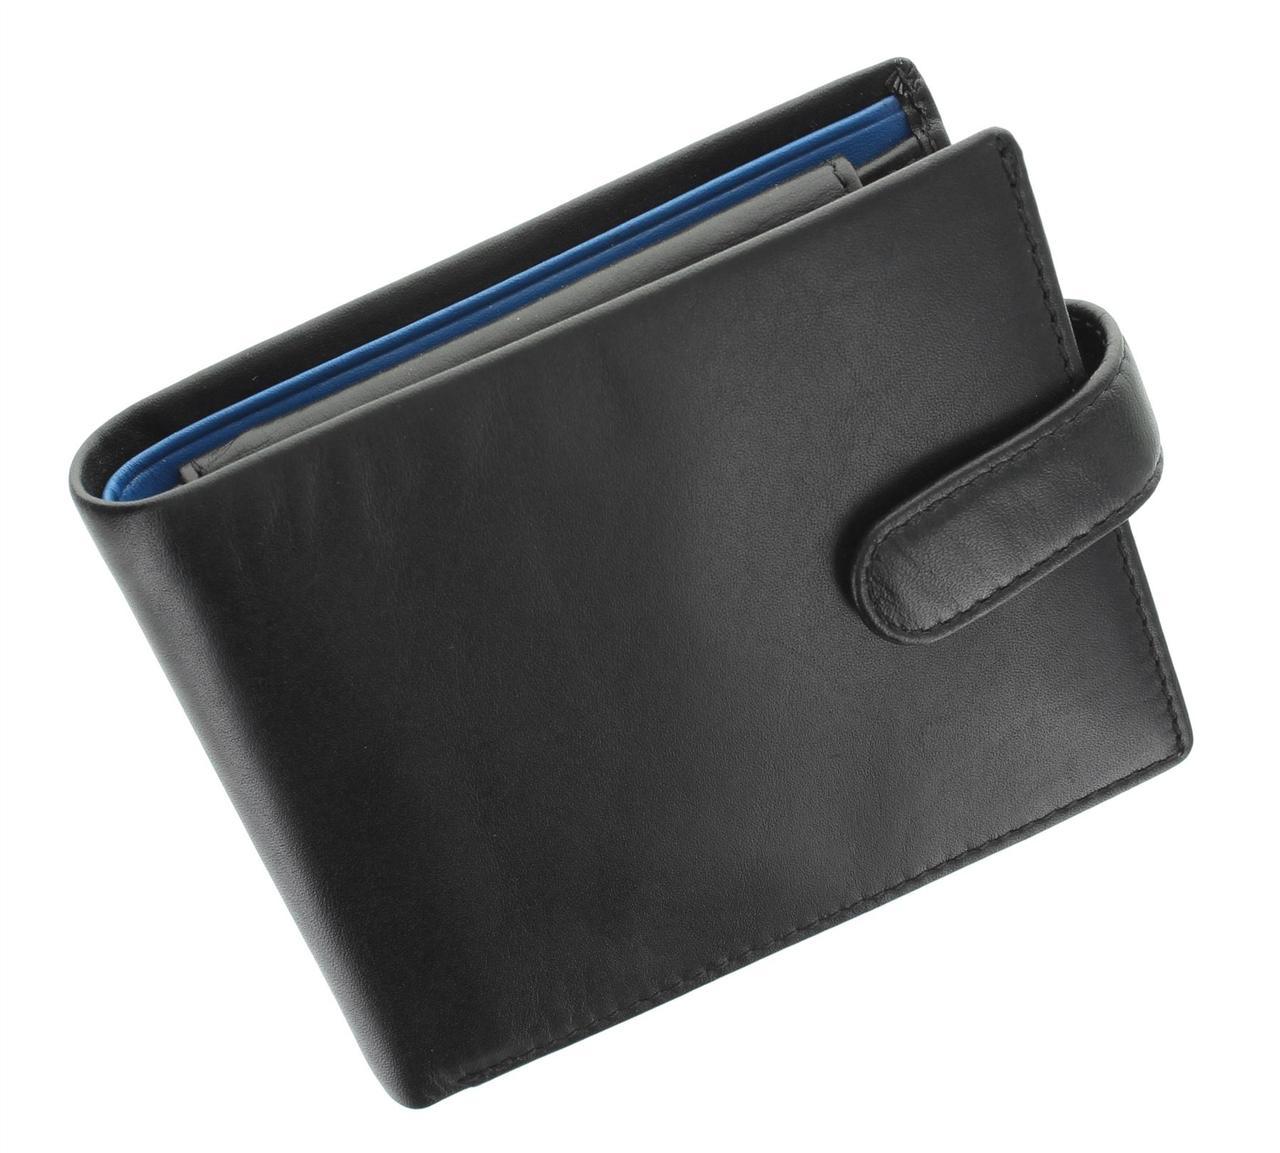 Черно-синее портмоне Visconti PM102 black/cobalt (Великобритания)